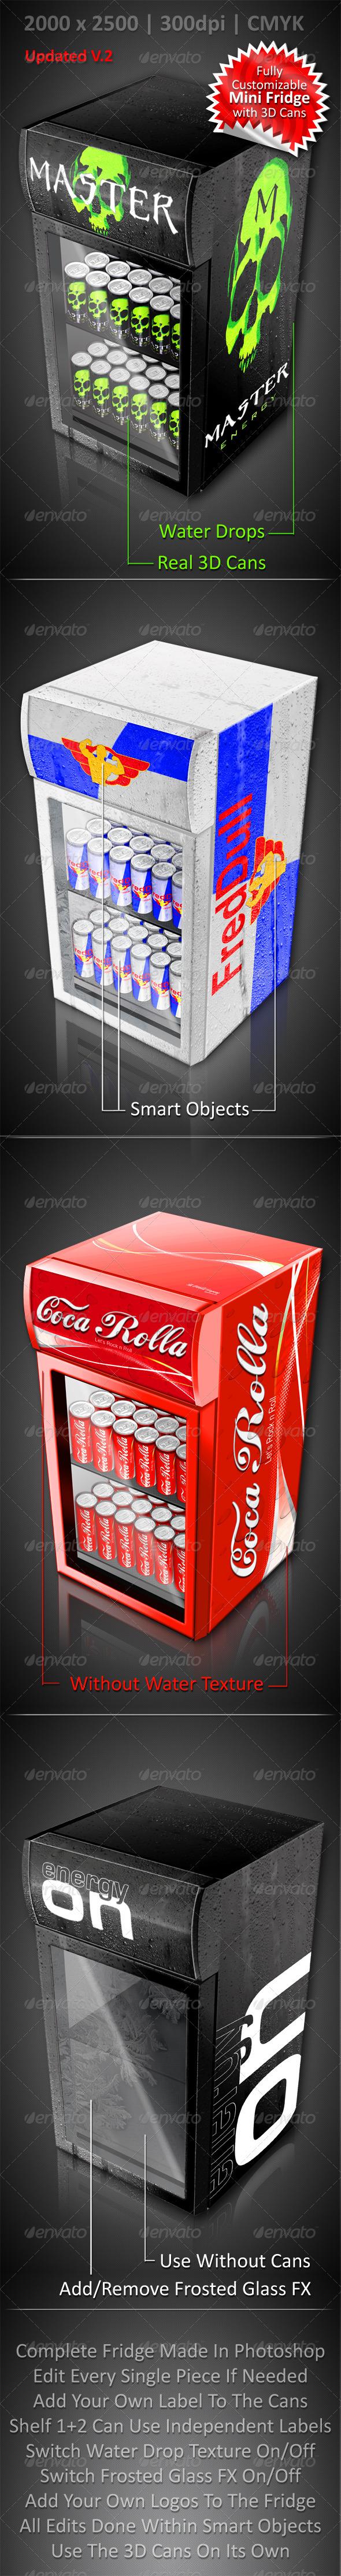 Energy Drink Soda Can Mini Fridge Mockup - Food and Drink Packaging